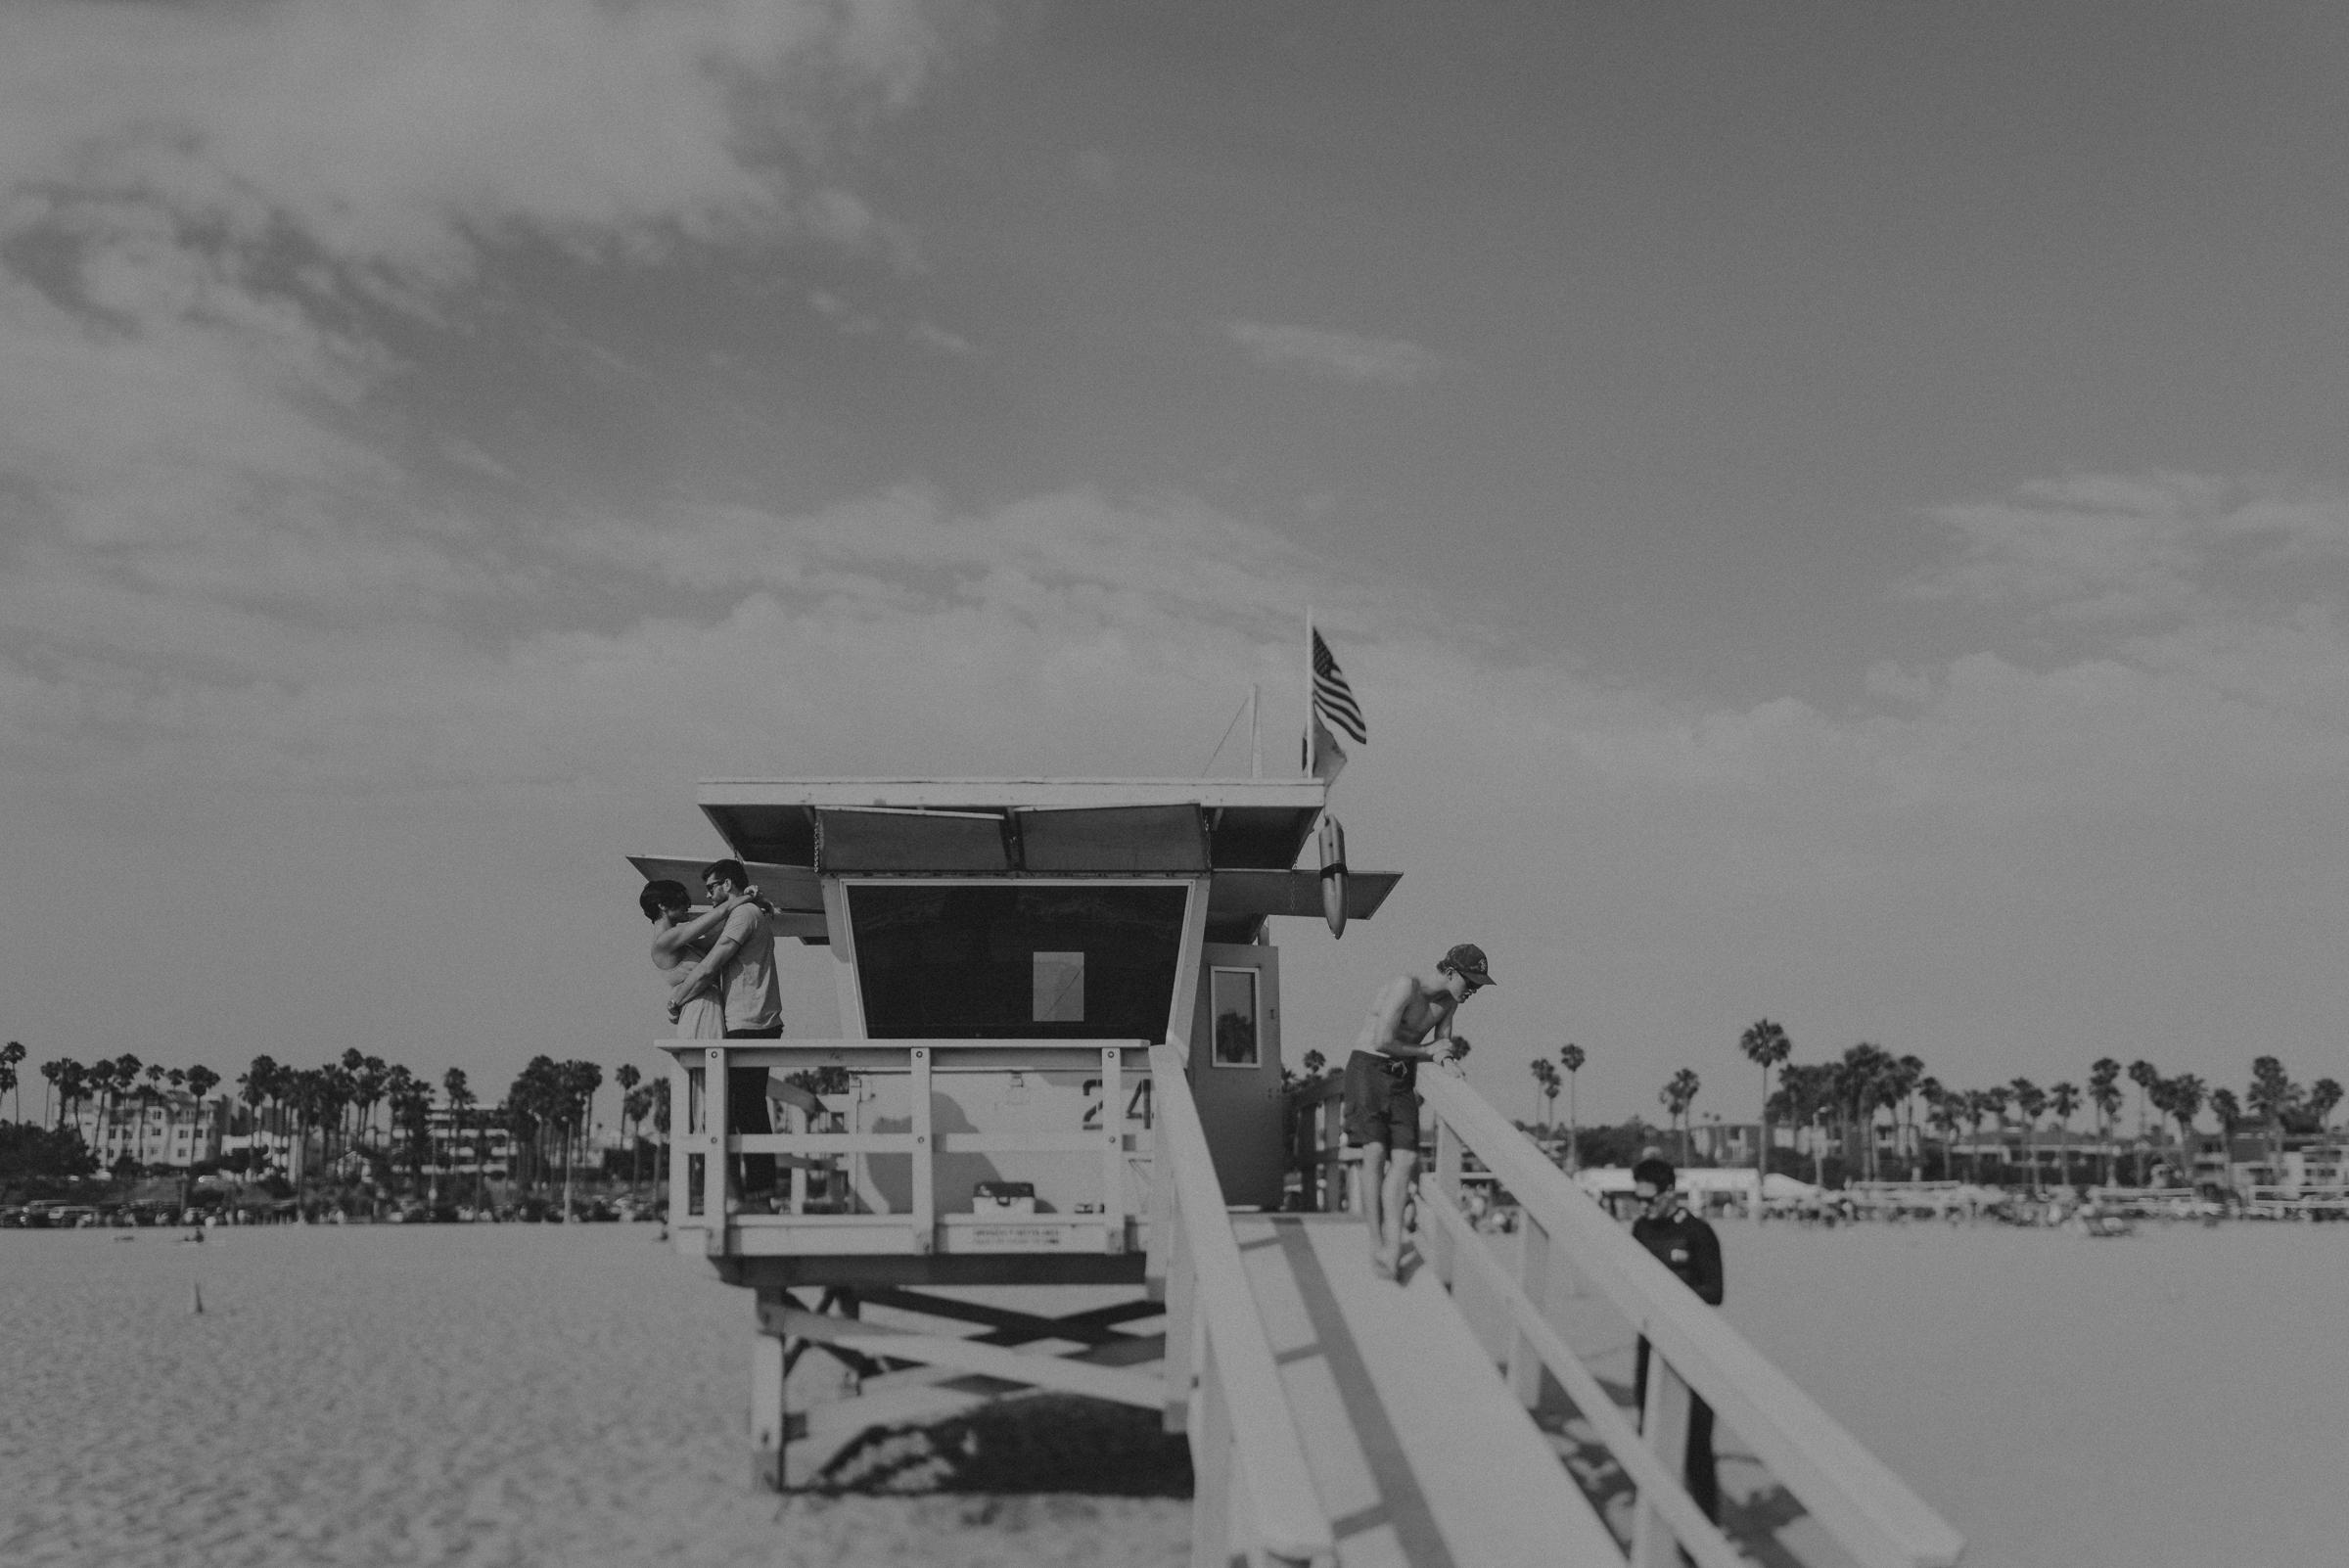 Isaiah + Taylor Photography - Venice Beach & Santa Monica Engagement Session, Los Angeles Wedding Photographer-063.jpg